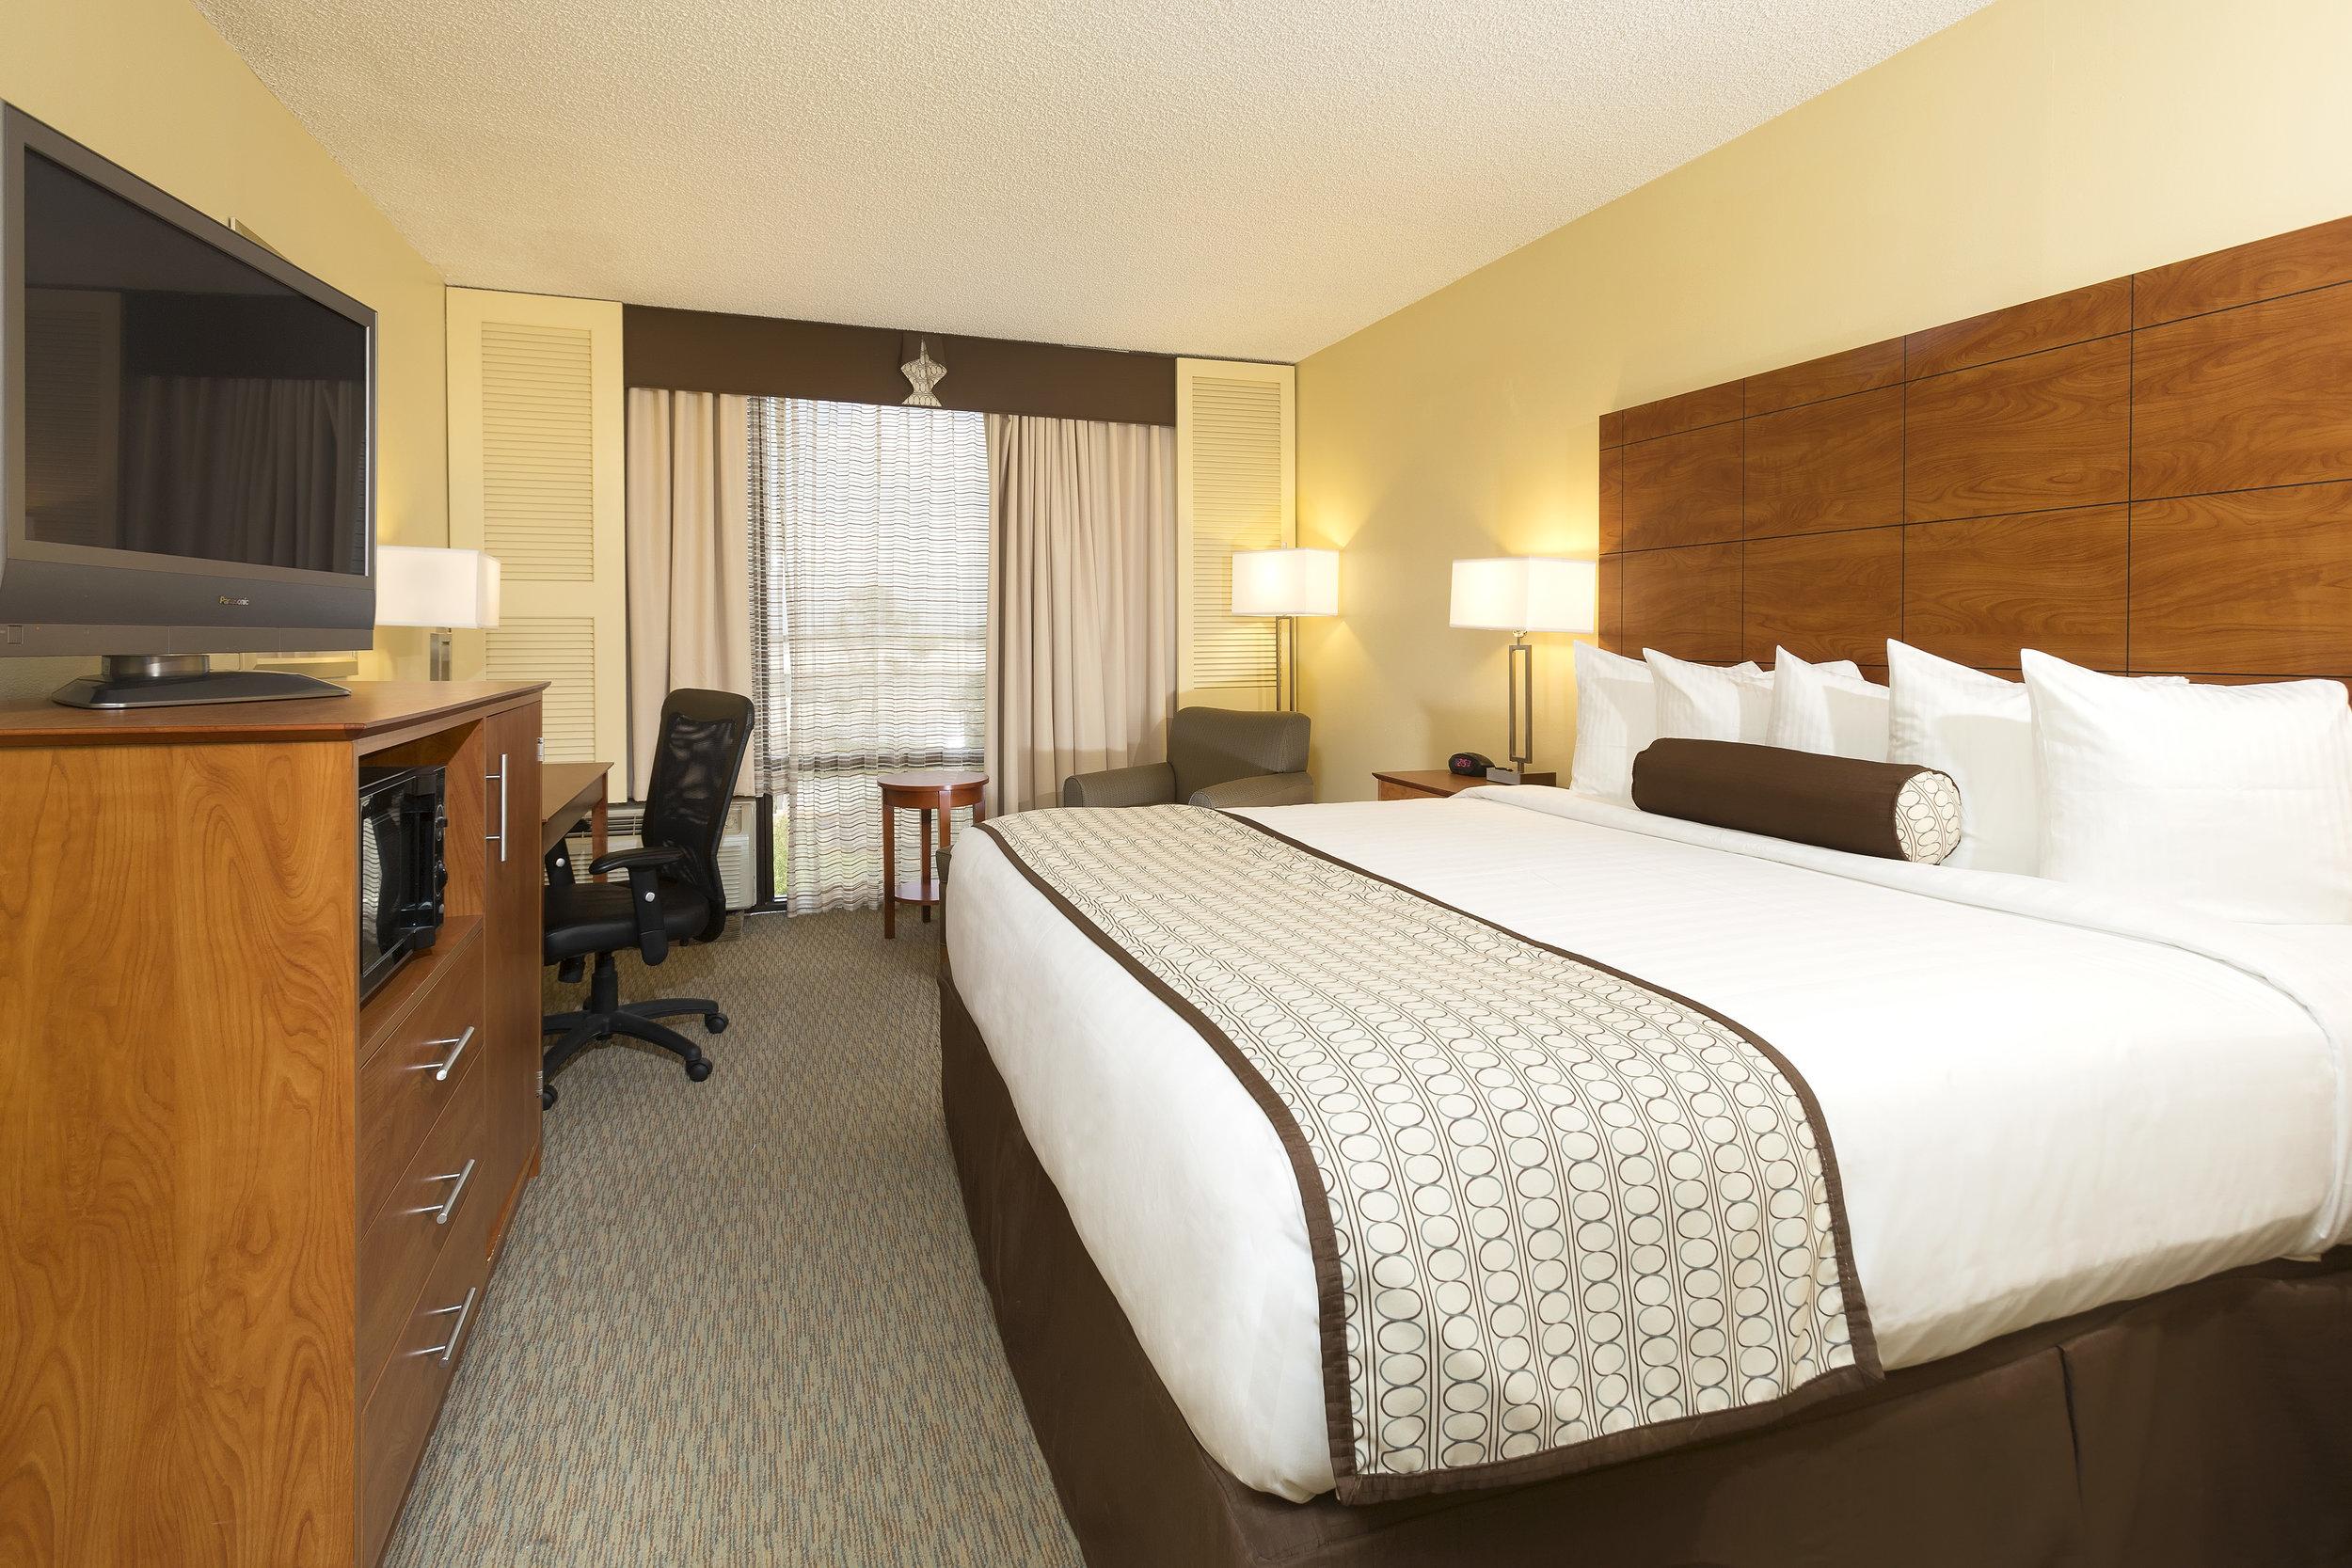 King Room 25603.jpg